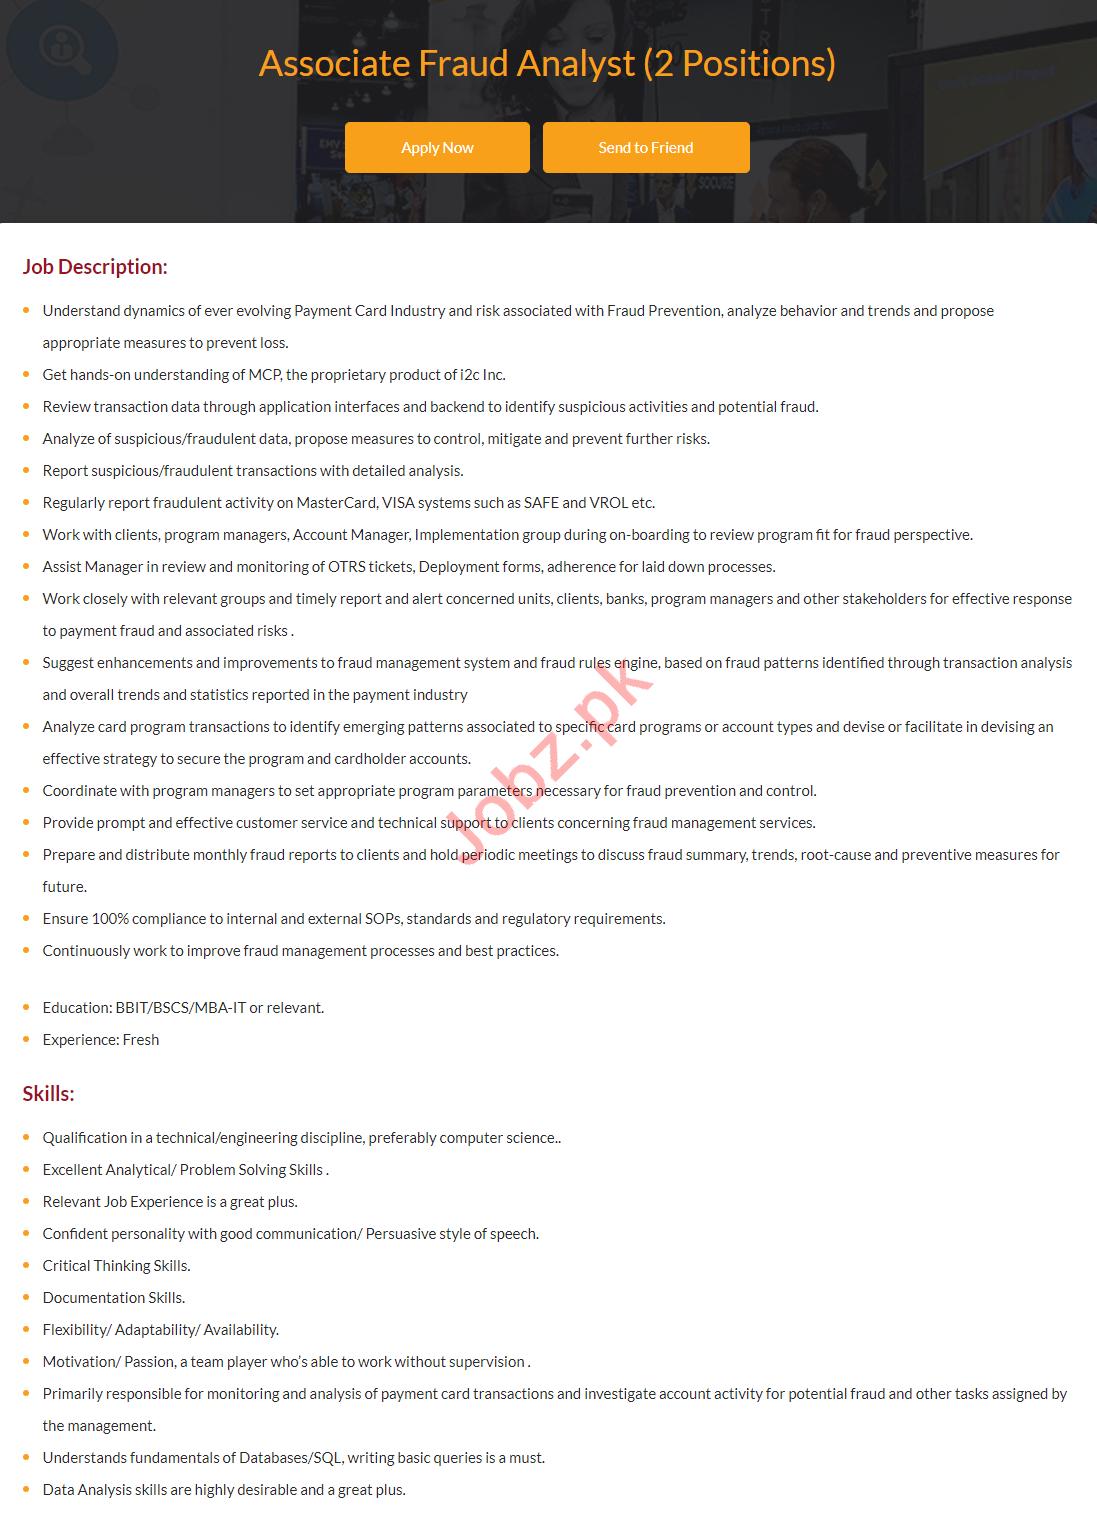 Associate Fraud Analyst Jobs 2019